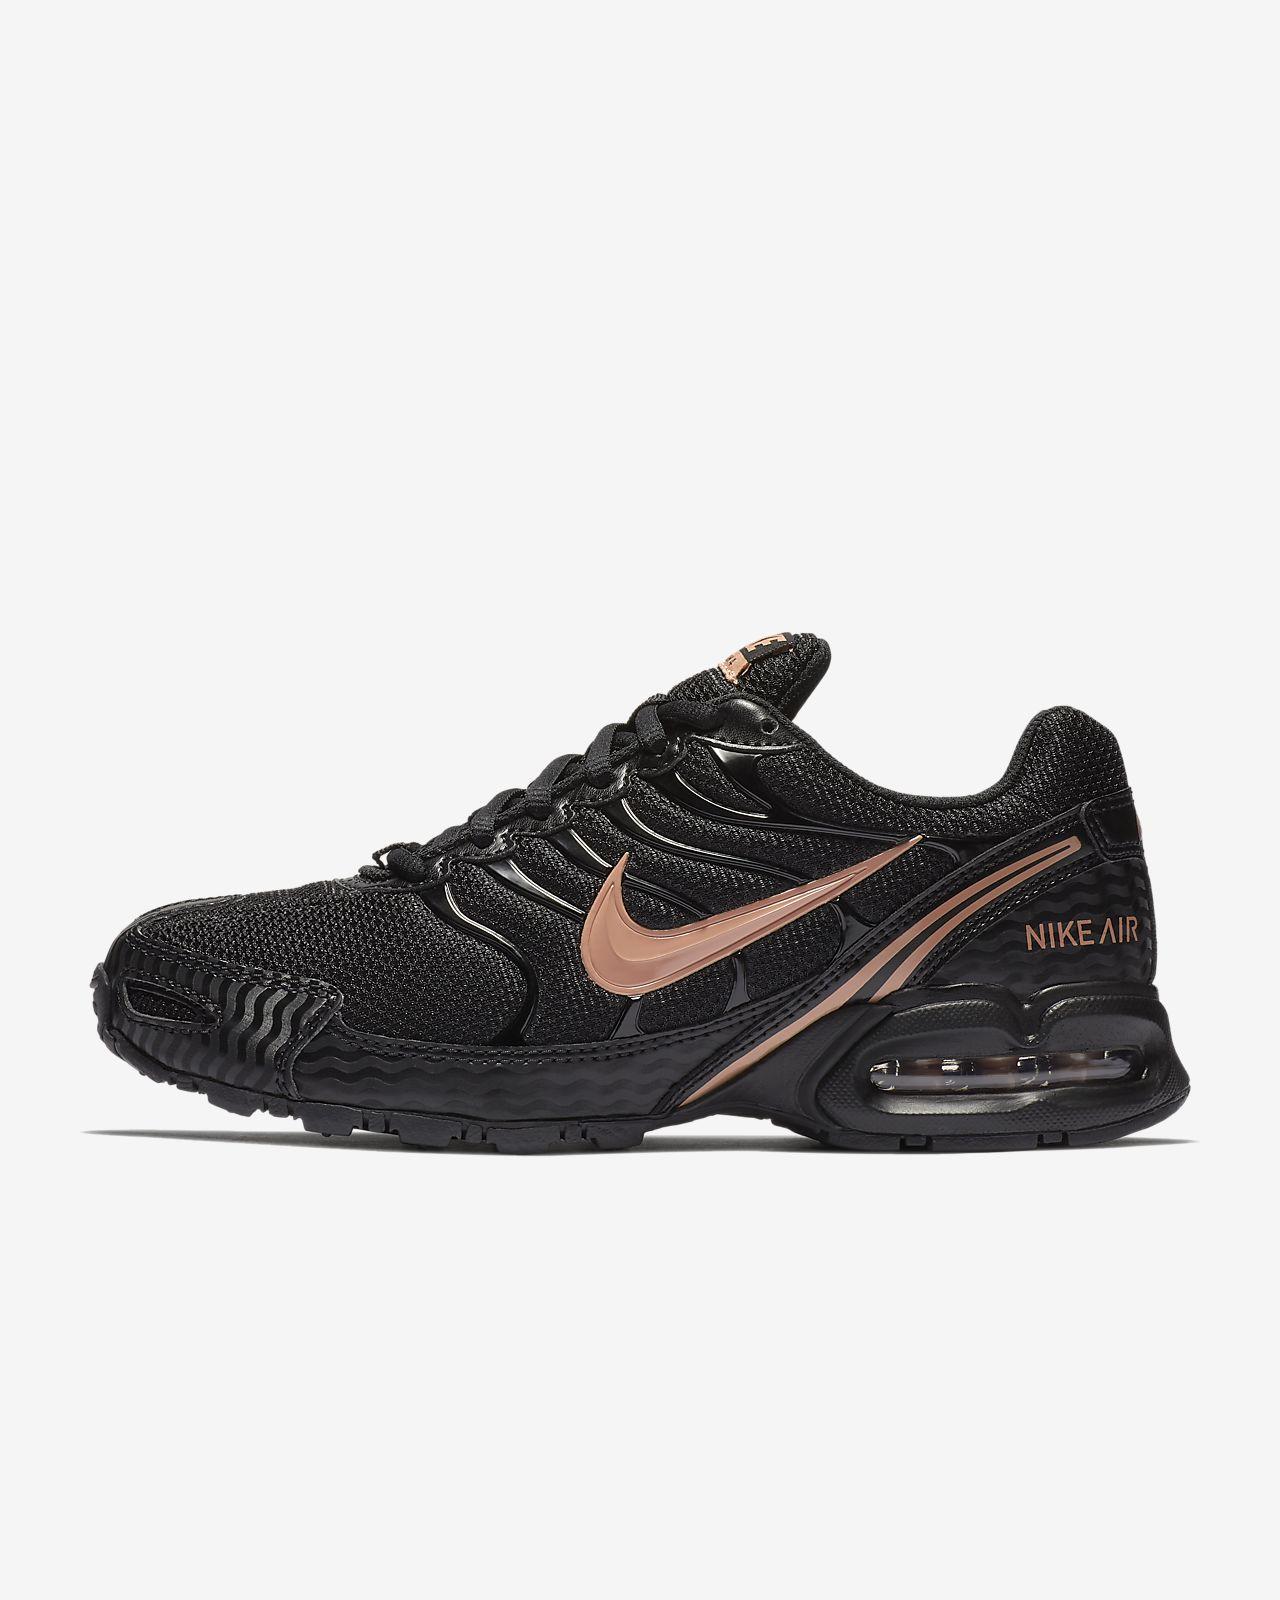 Nike Air Max Torch 4 Women's Running Shoe